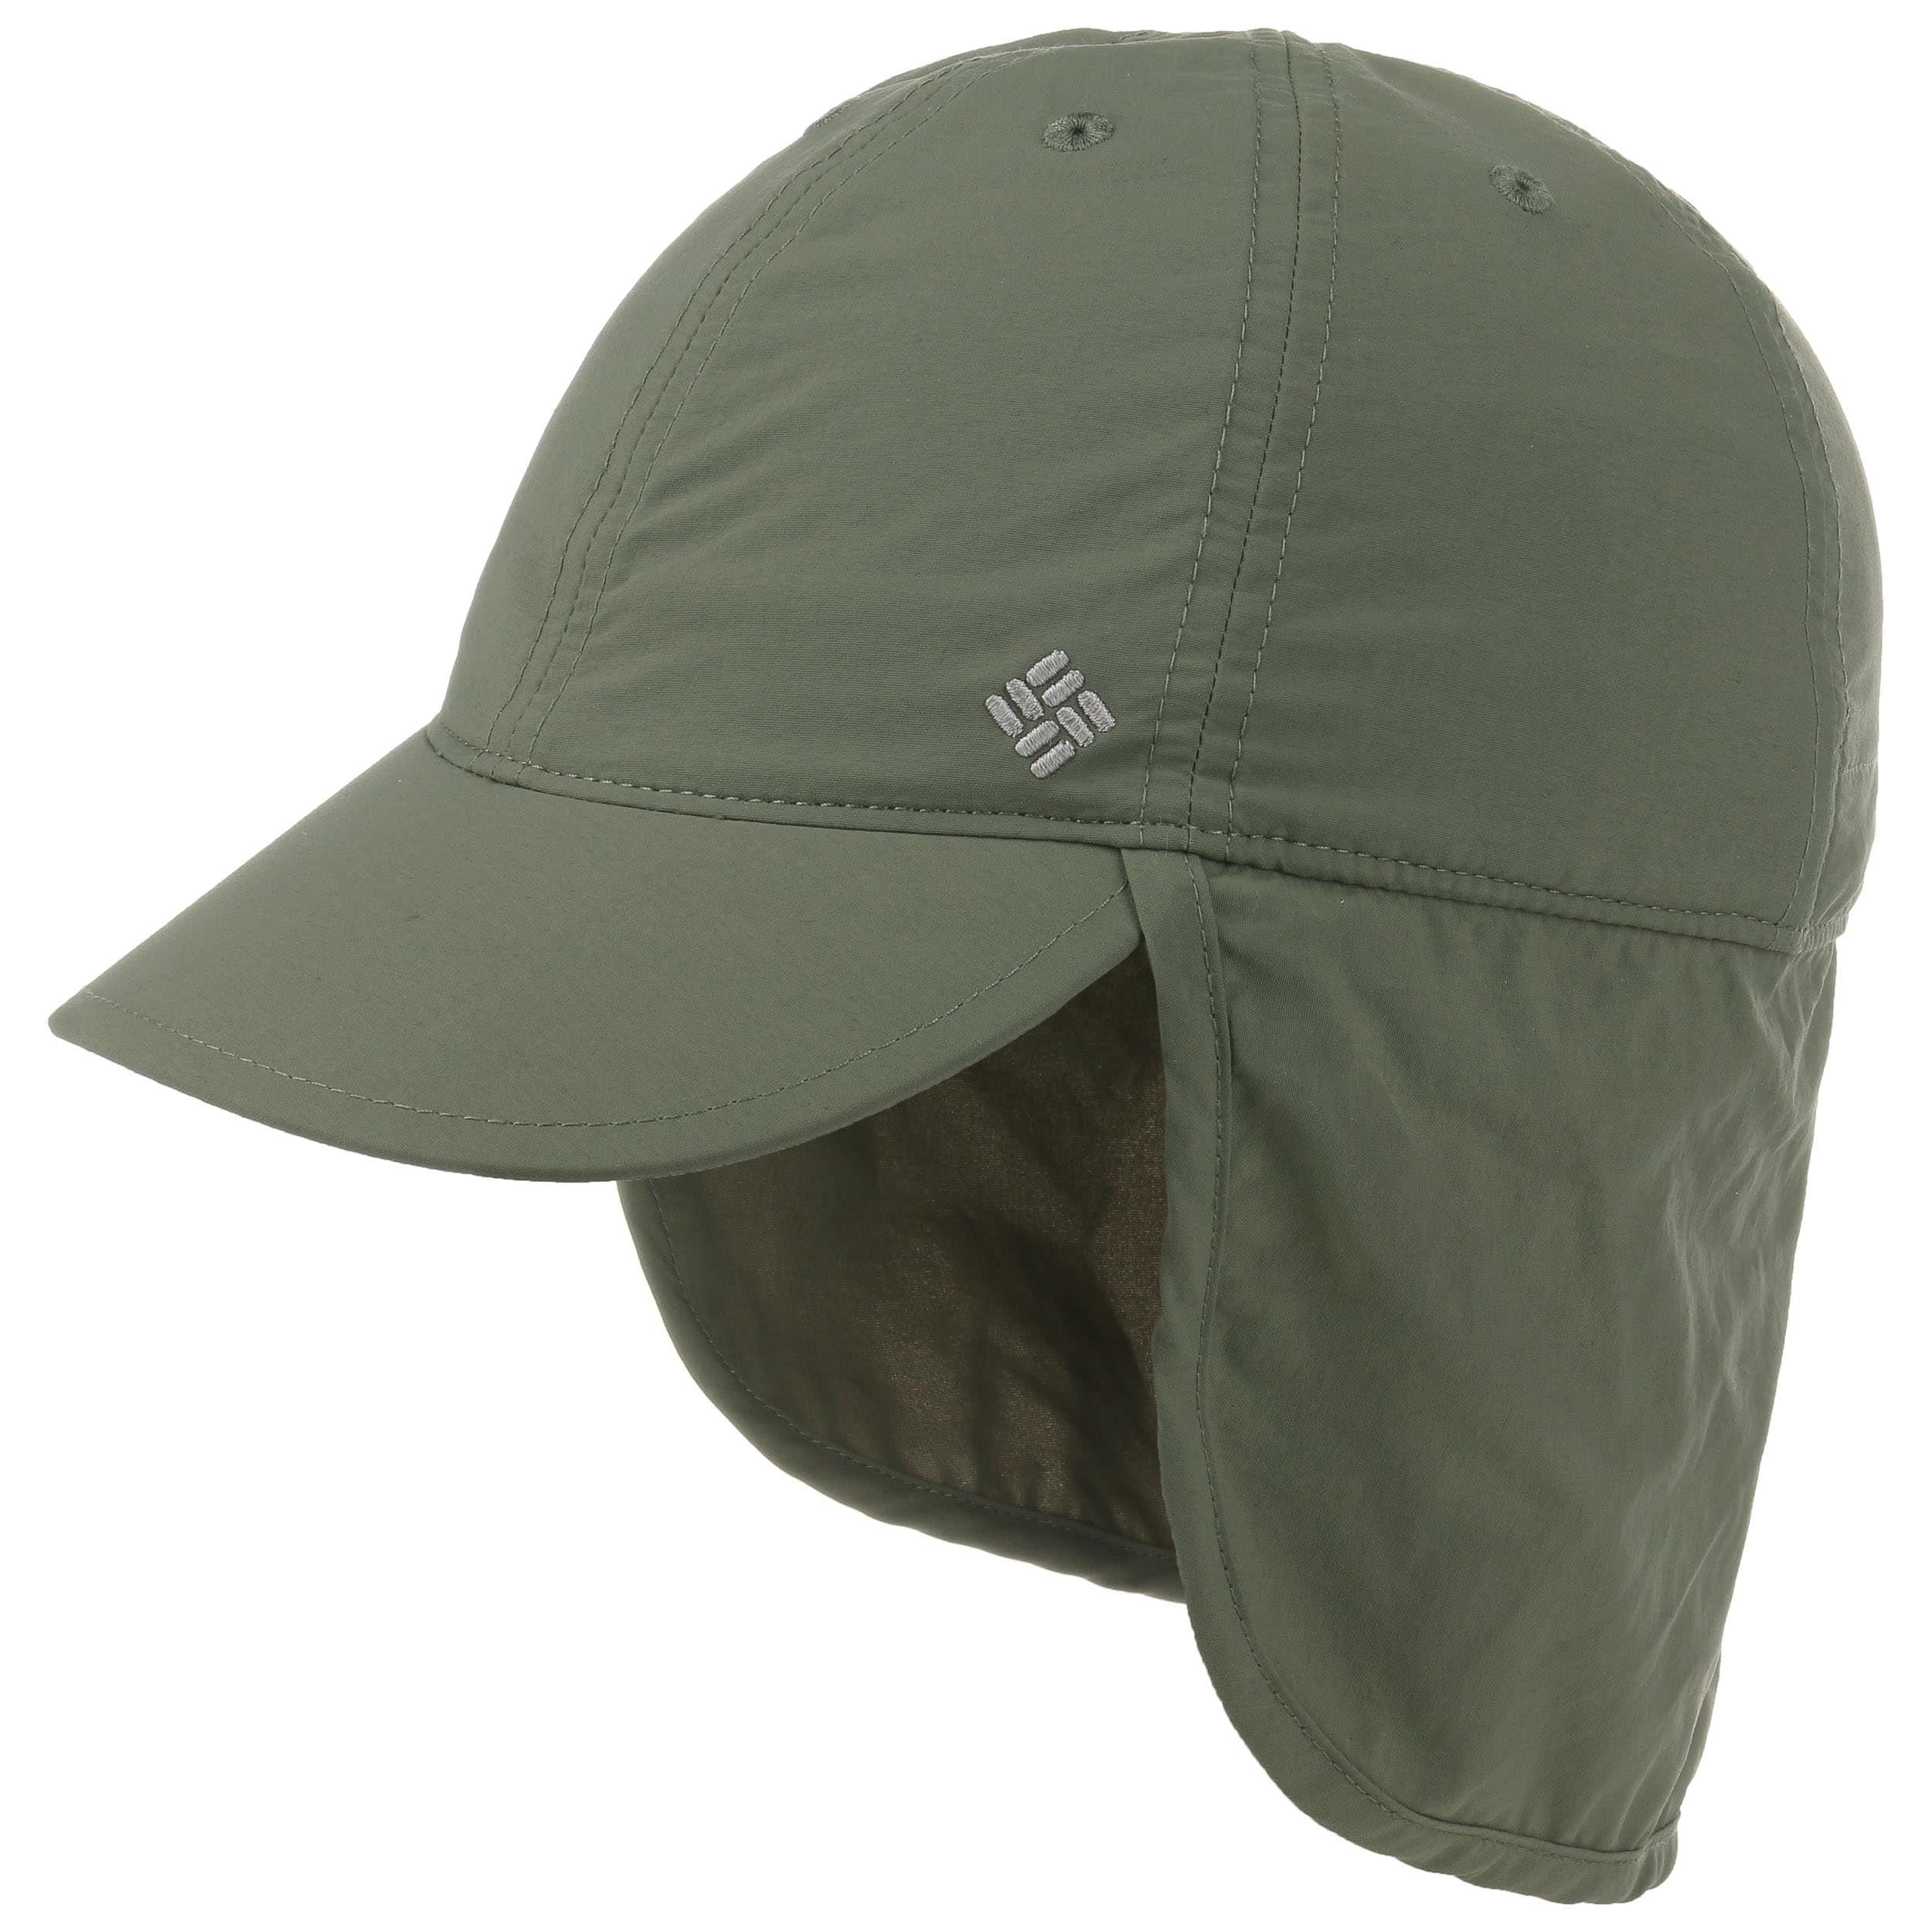 993038e1449 Cachalot junior high uv cap columbia hats caps jpg 2500x2500 Columbia cap